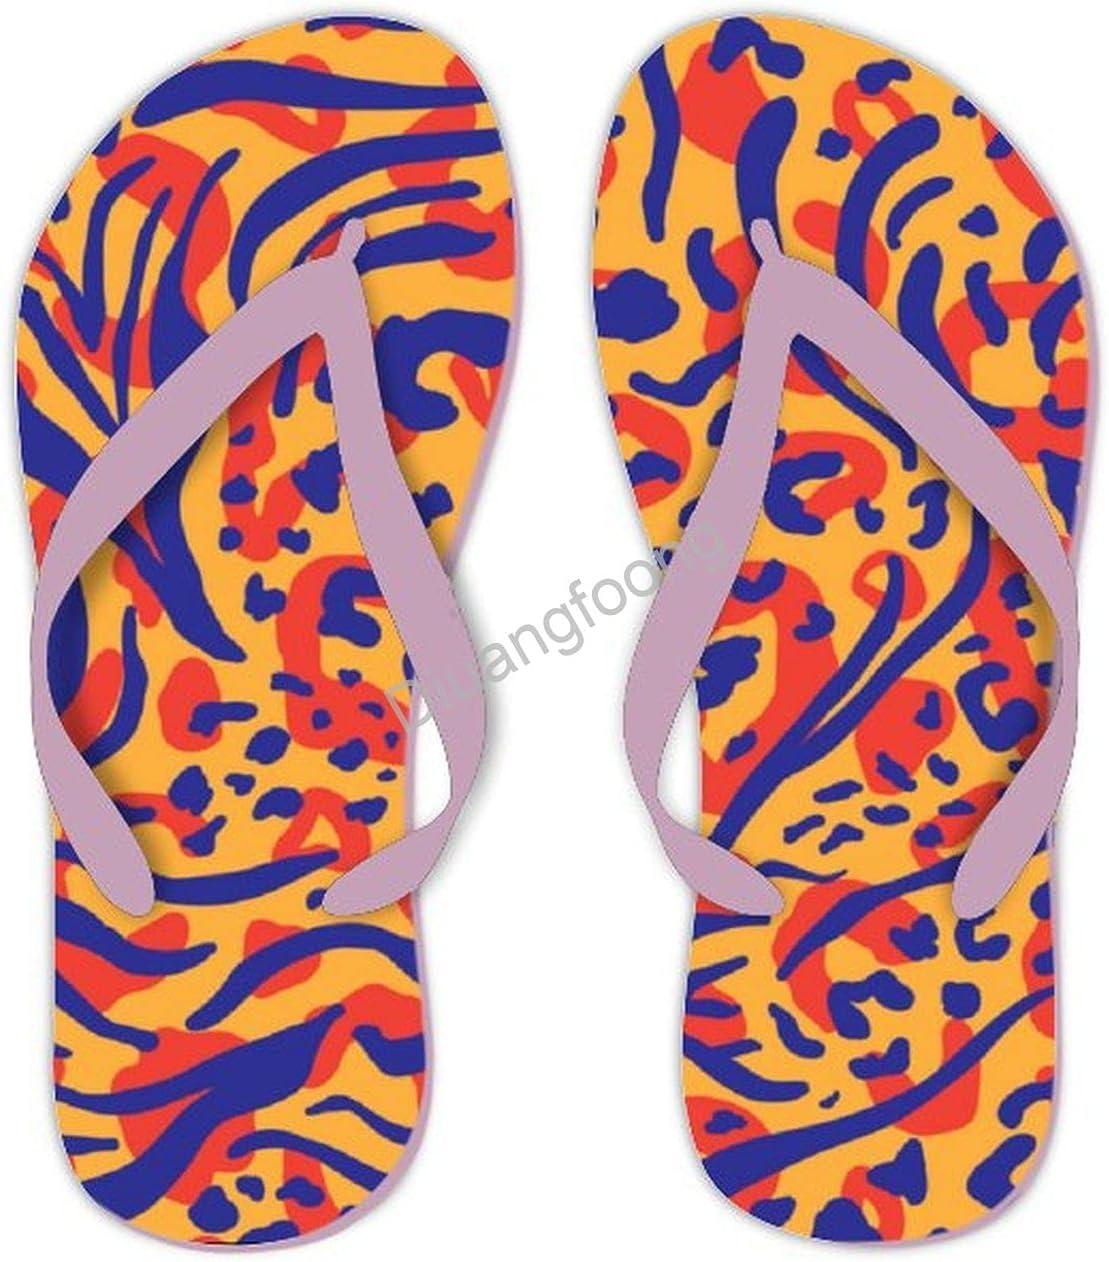 Leopard Flip Flops Beach Unisex Thong Sandals Cute Sandal For House Bathroom Party Pink-Style6